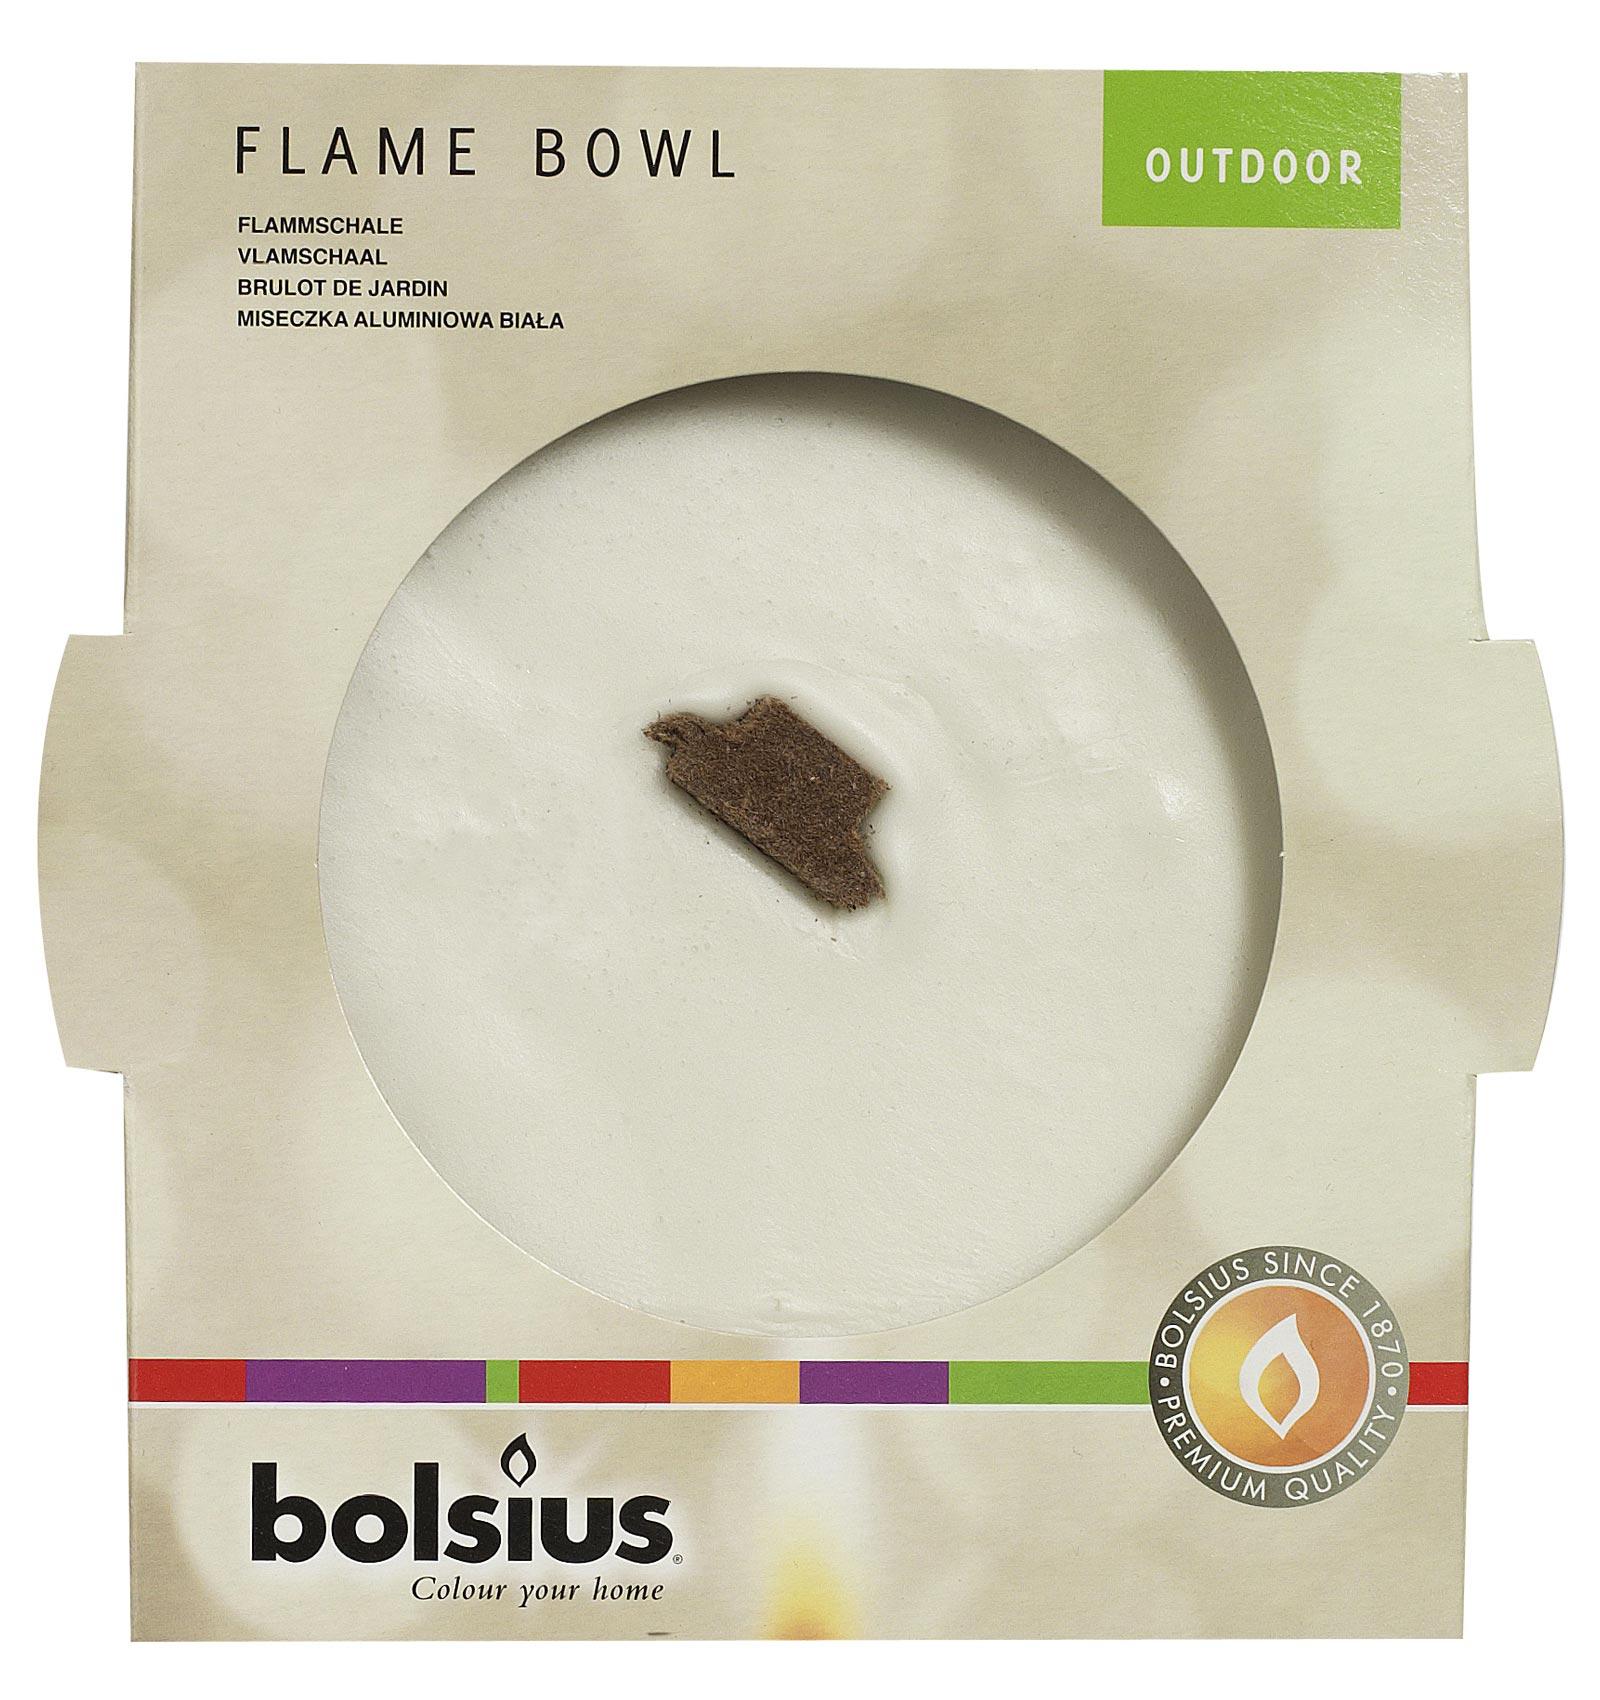 Bolsius Grablicht / Flammschale Alu weiß Ø 160 mm Bild 1